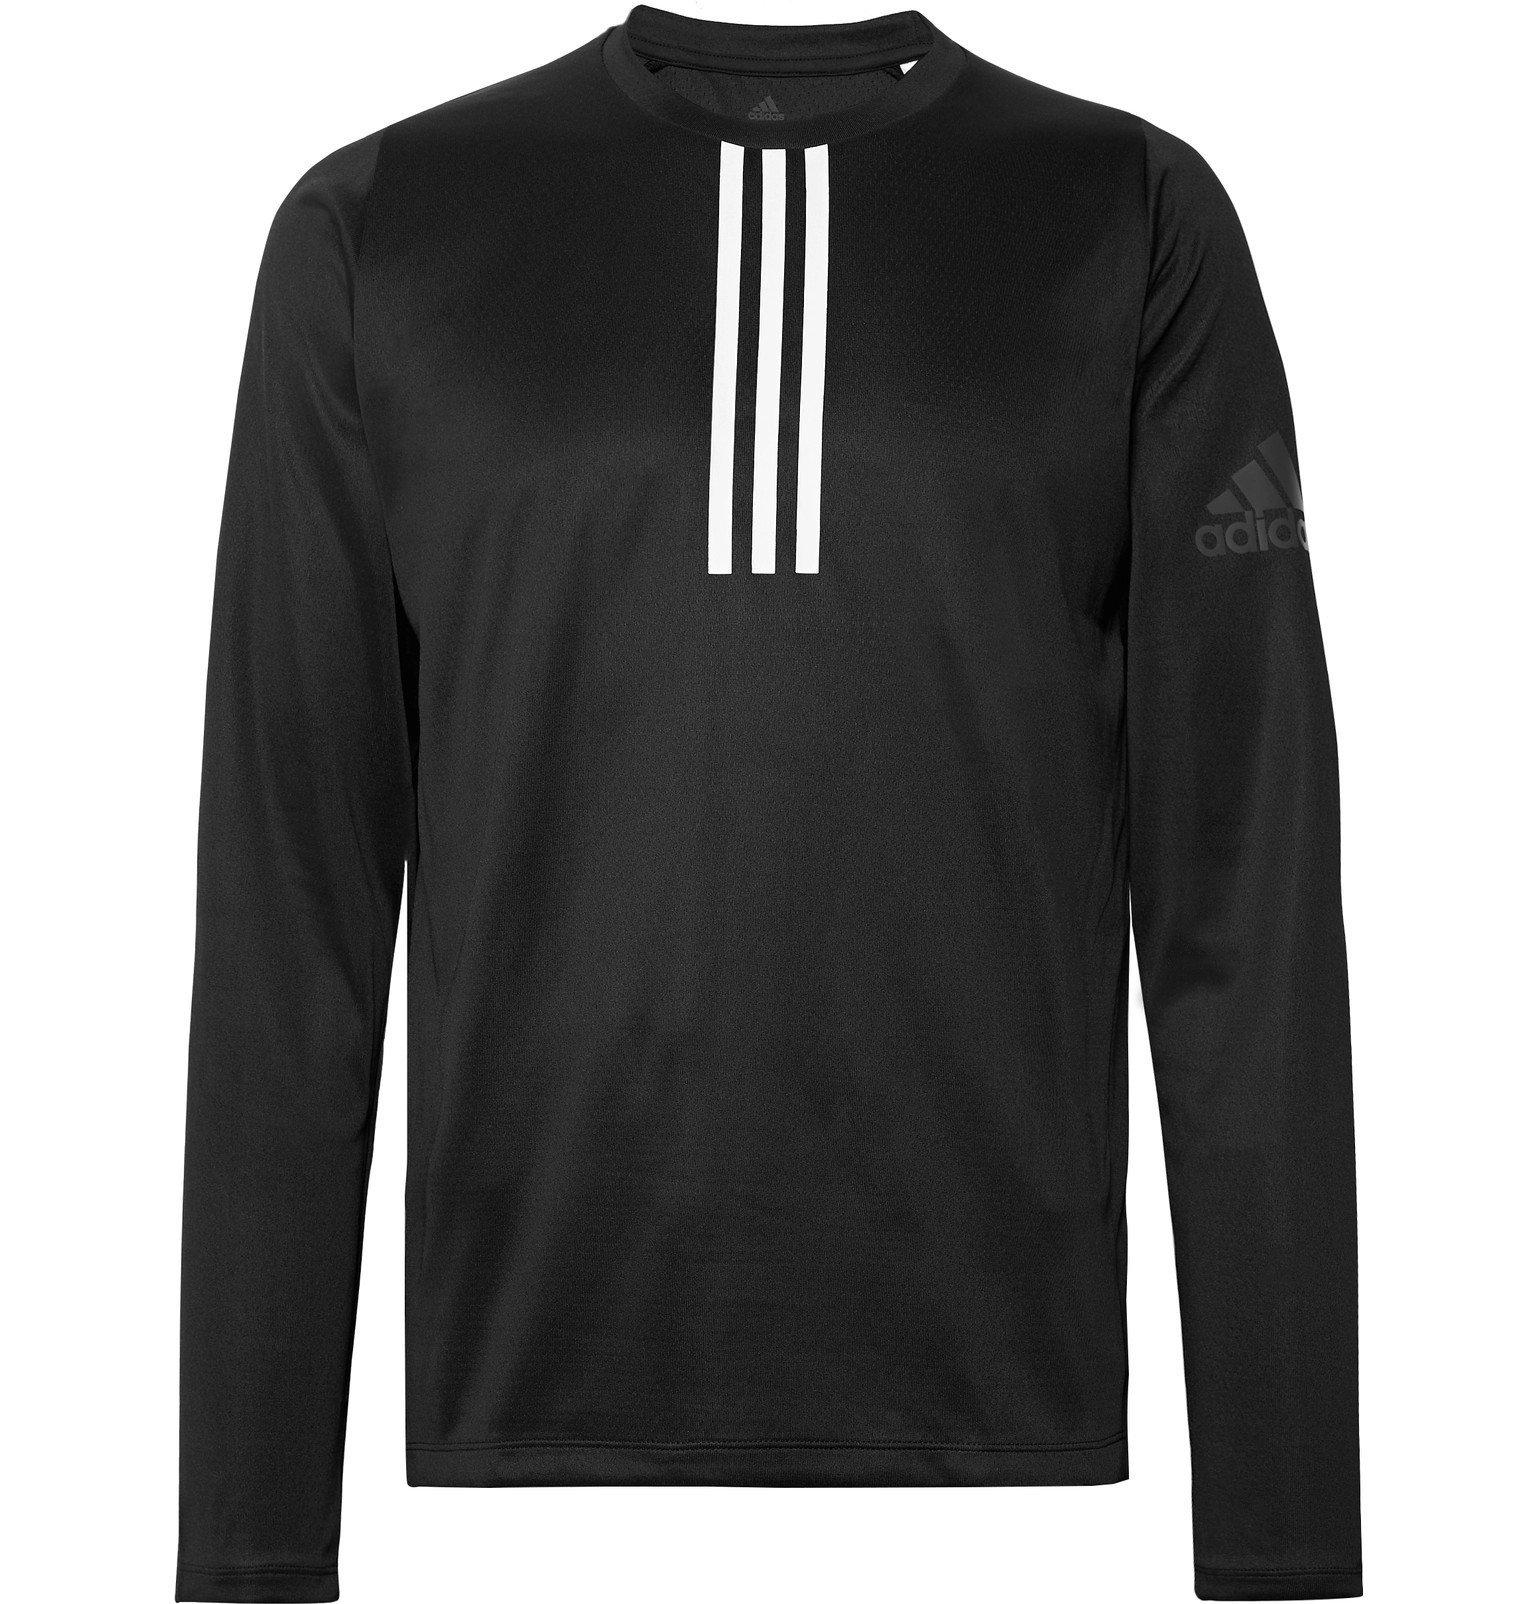 Adidas Sport - FreeLift Climawarm T-Shirt - Black